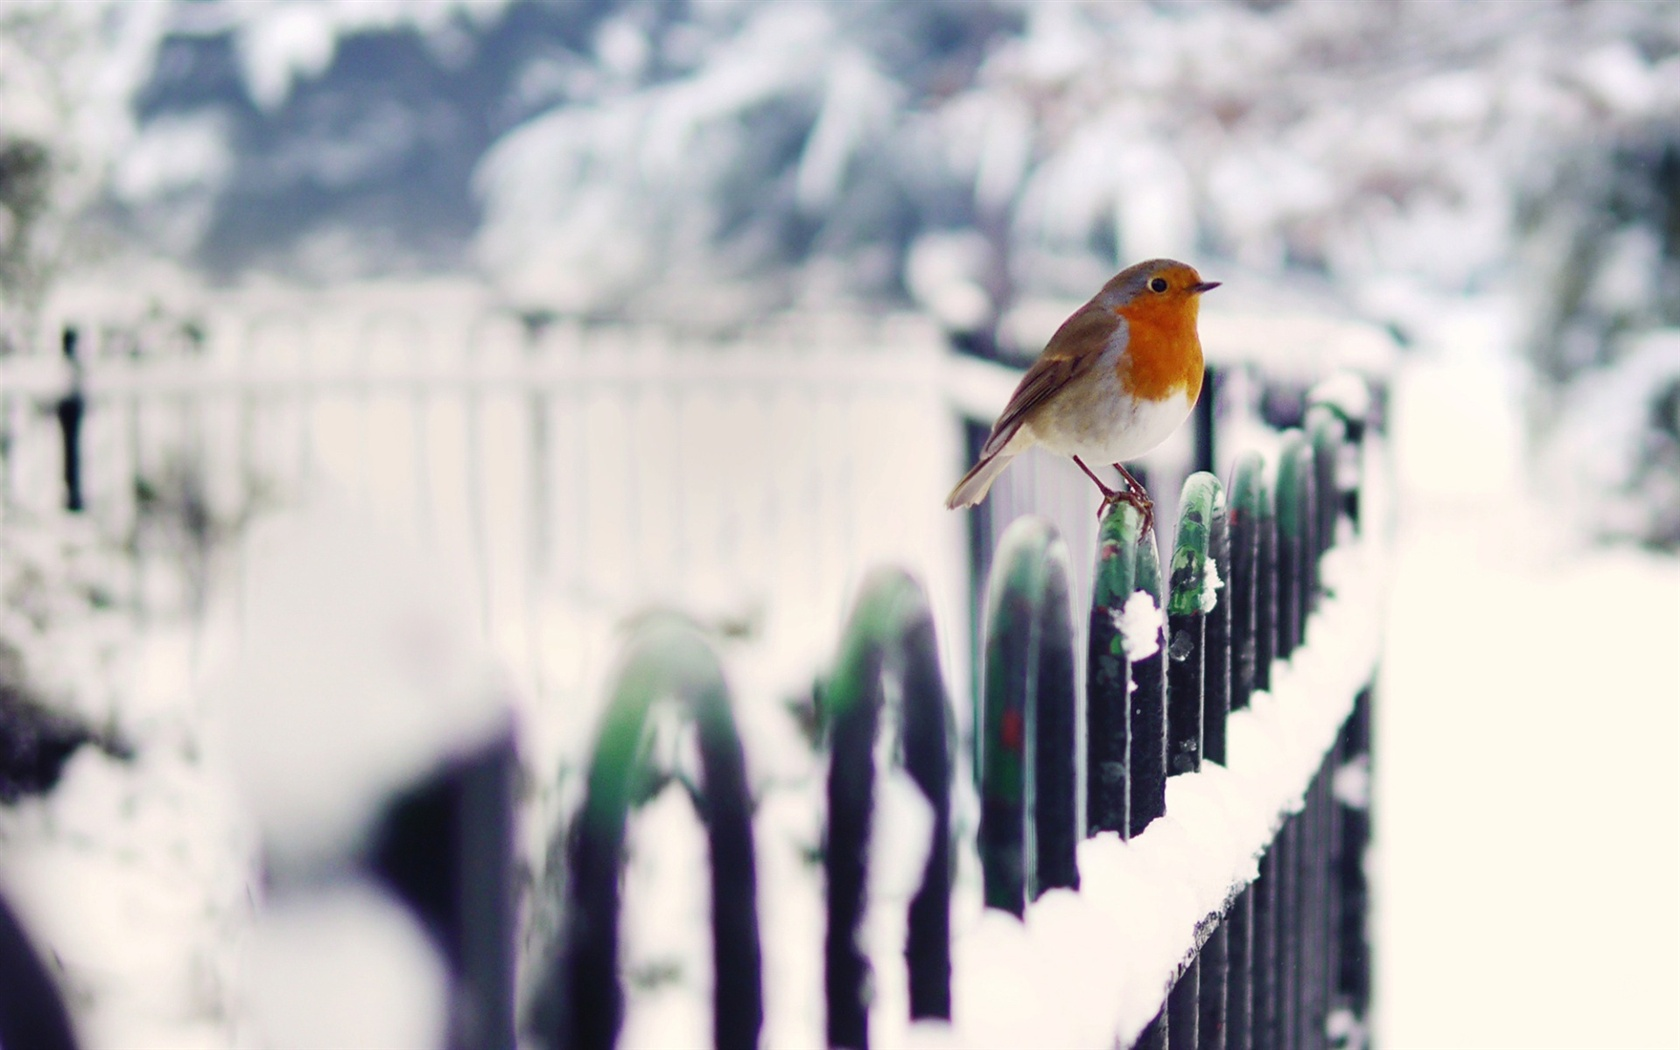 Download Wallpaper 1680x1050 Winter bird snow fence HD ...